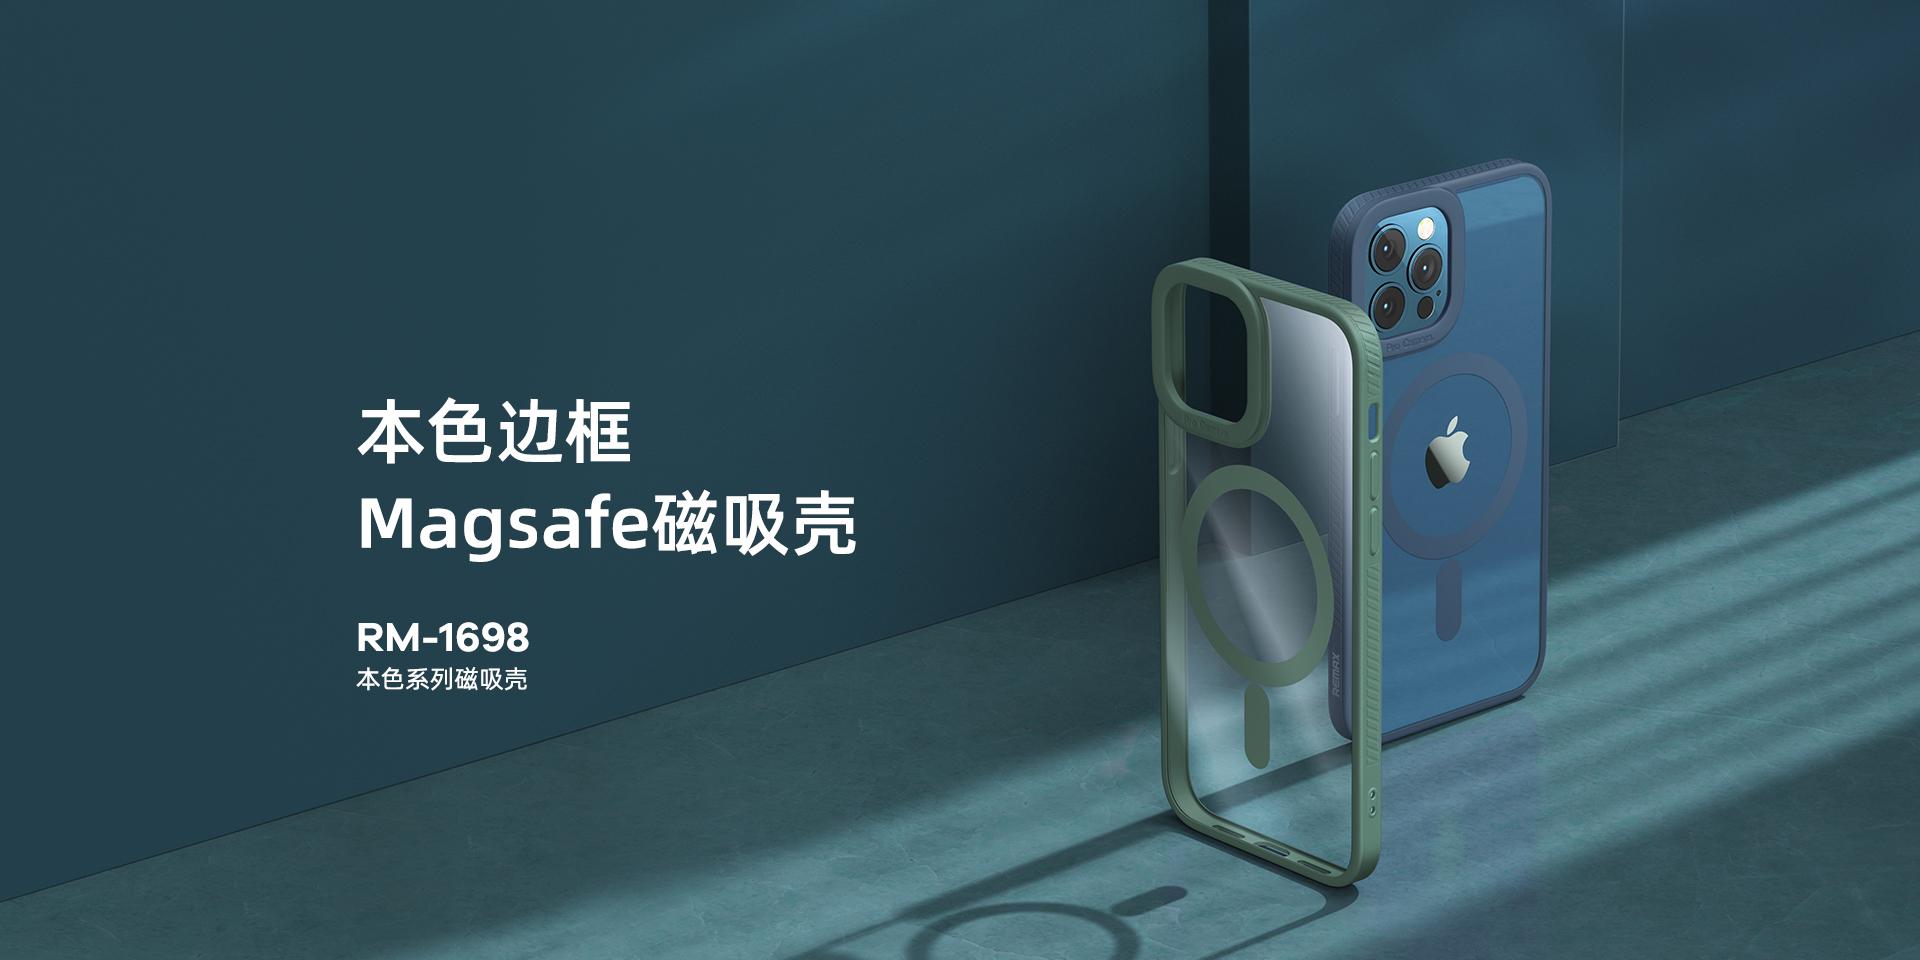 RM1698本色磁吸壳-网页_01